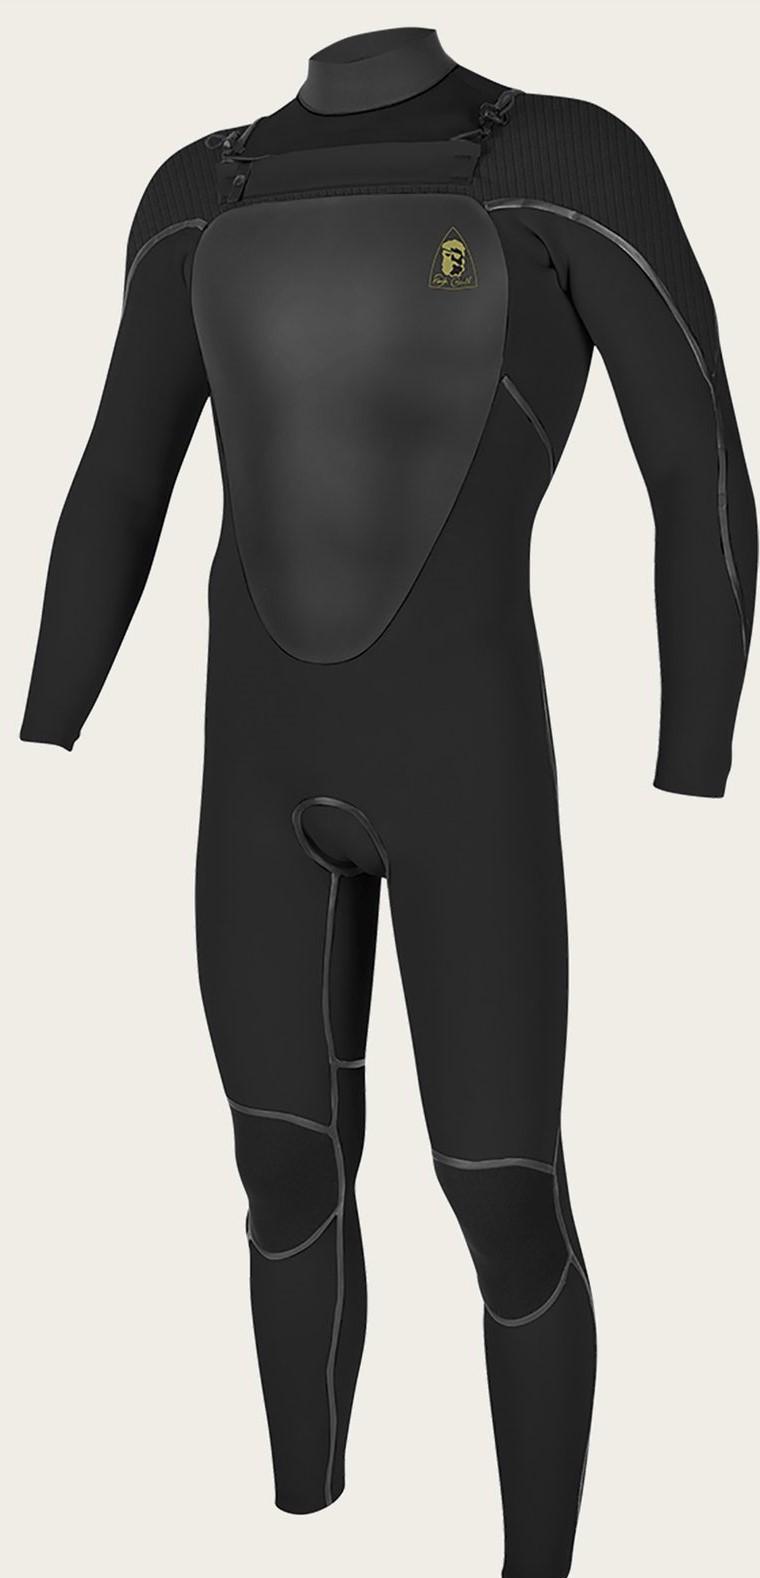 image oneill-mutant-legend-wetsuit-jpg